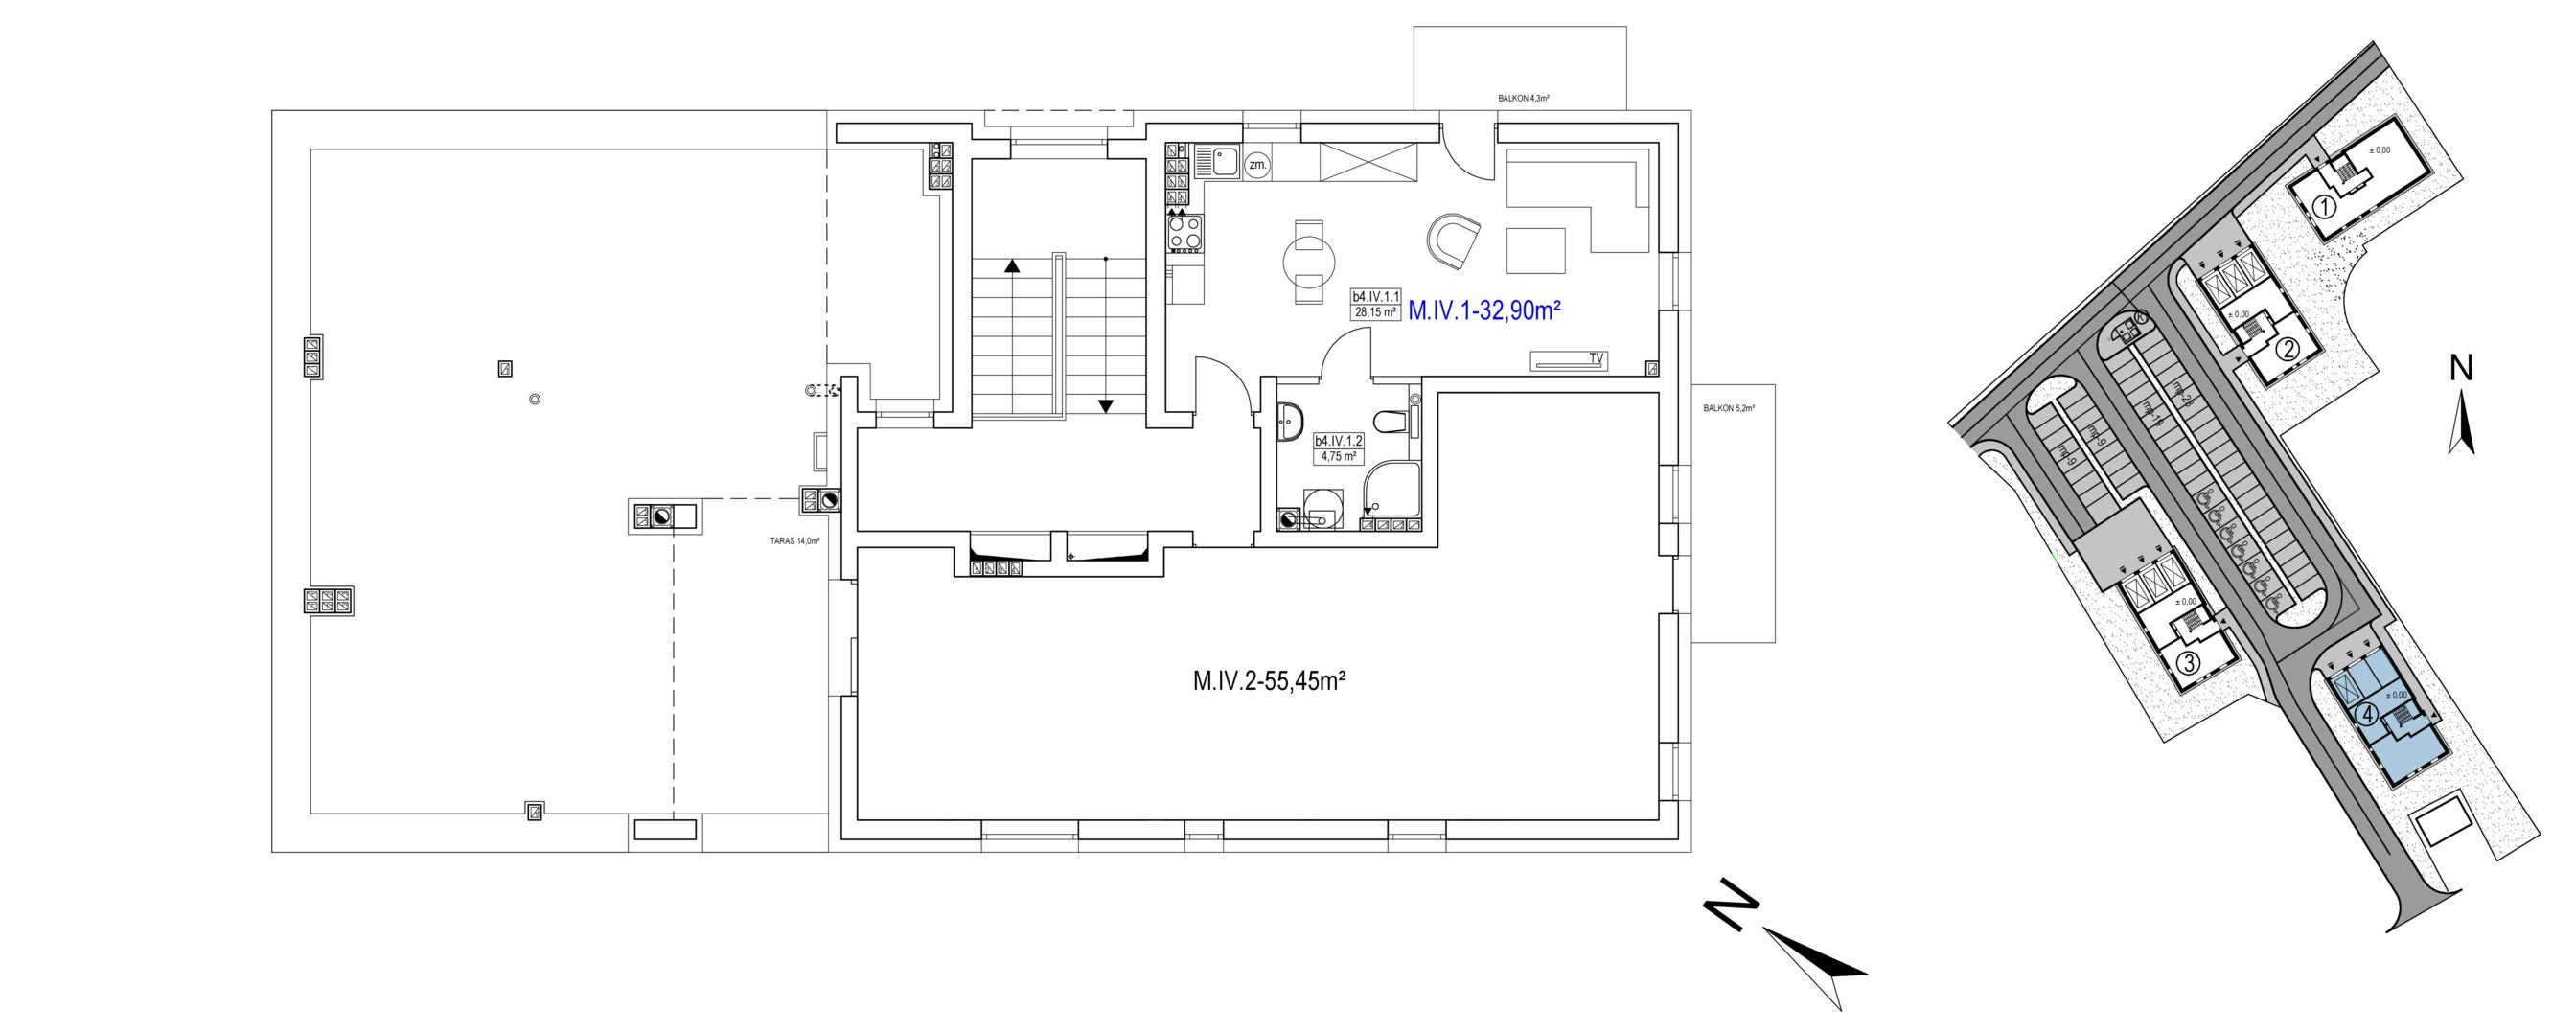 /assets/img/flats/B4.M.IV.1.jpg